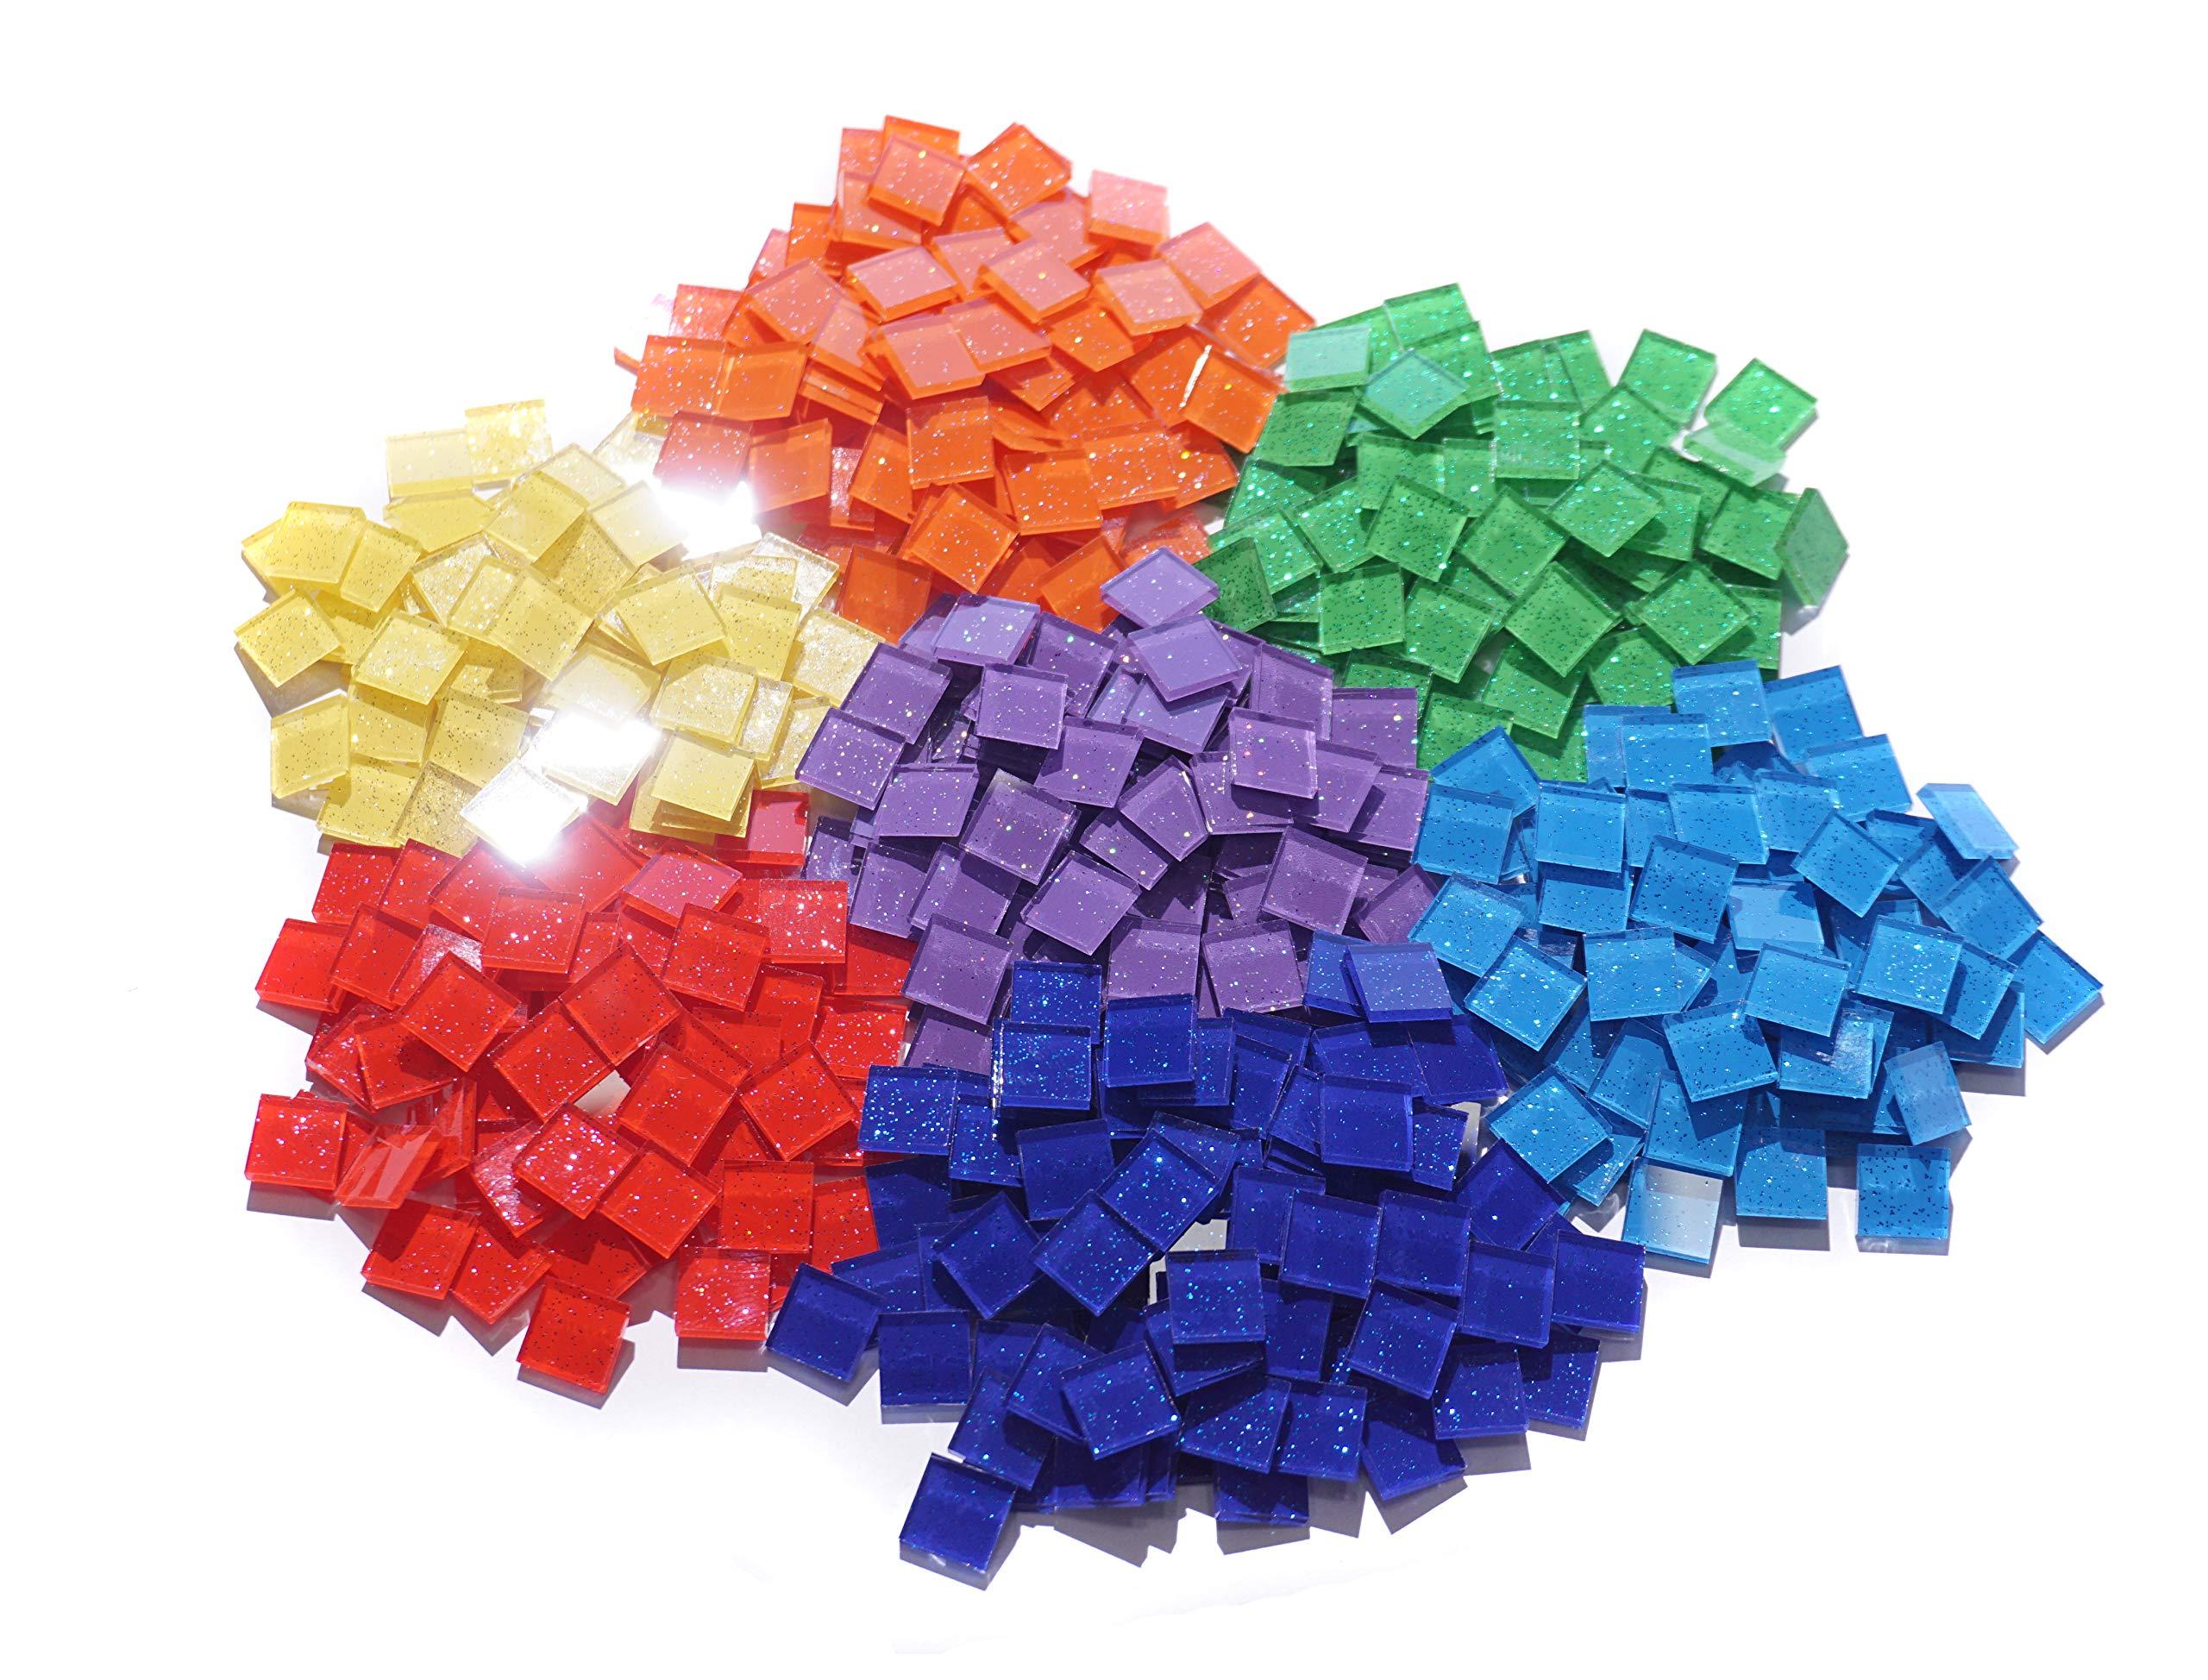 3/8'' Square Assorted Color Glass Mosaic Tile -1000pcs by Aleksander Hreben